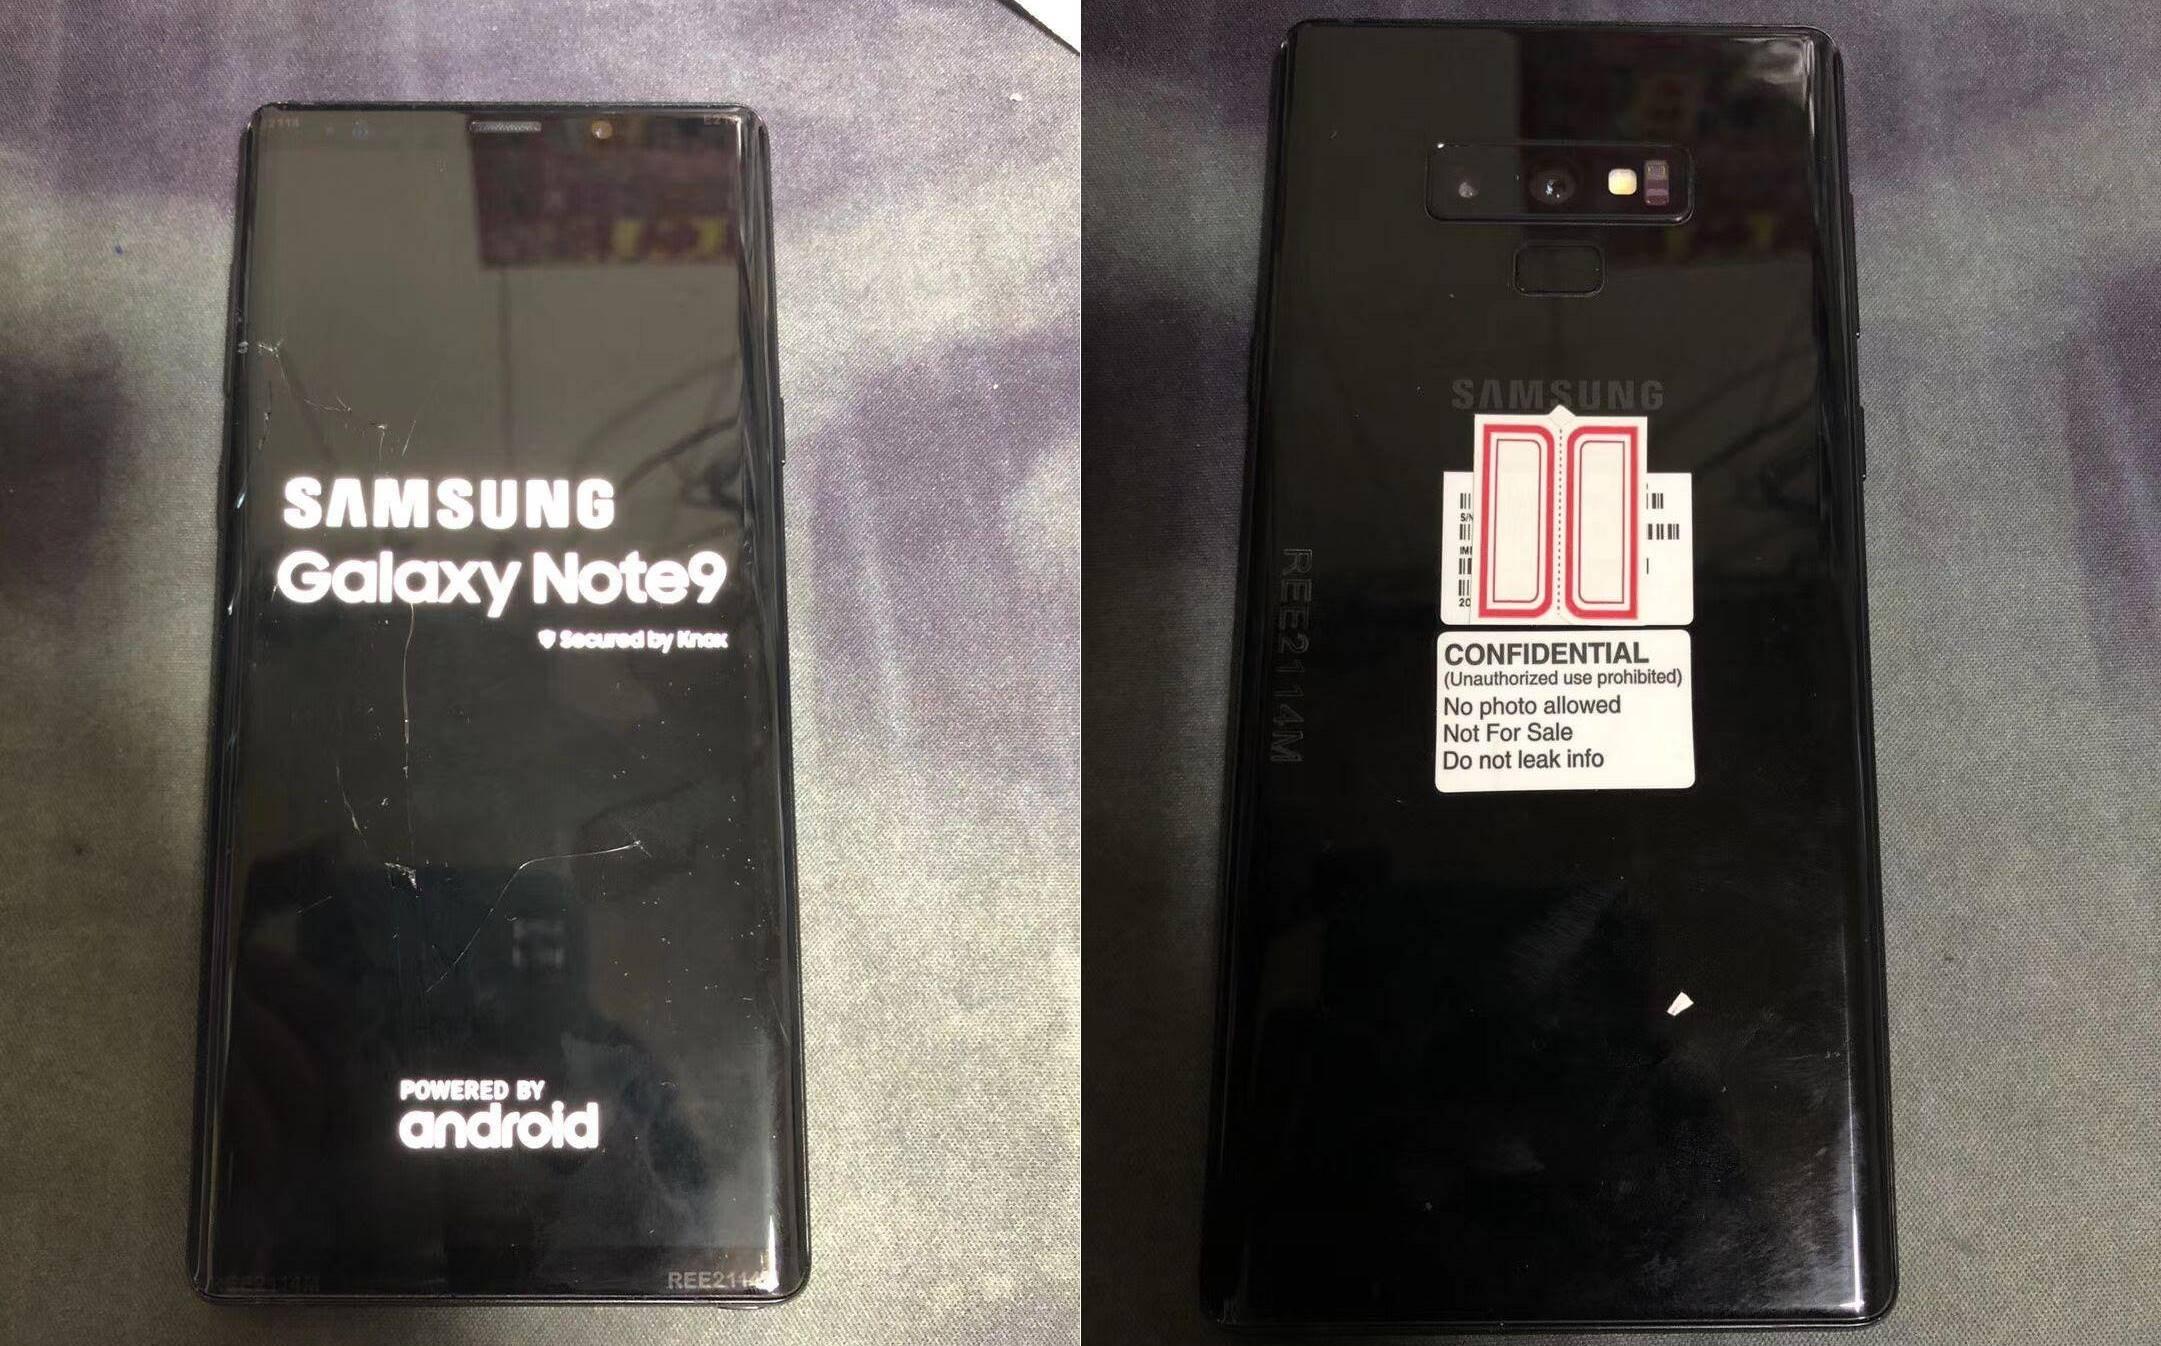 Samsung GALAXY Note 9 Imagini UNITATE REALA Camera CIUDATA 351230 1